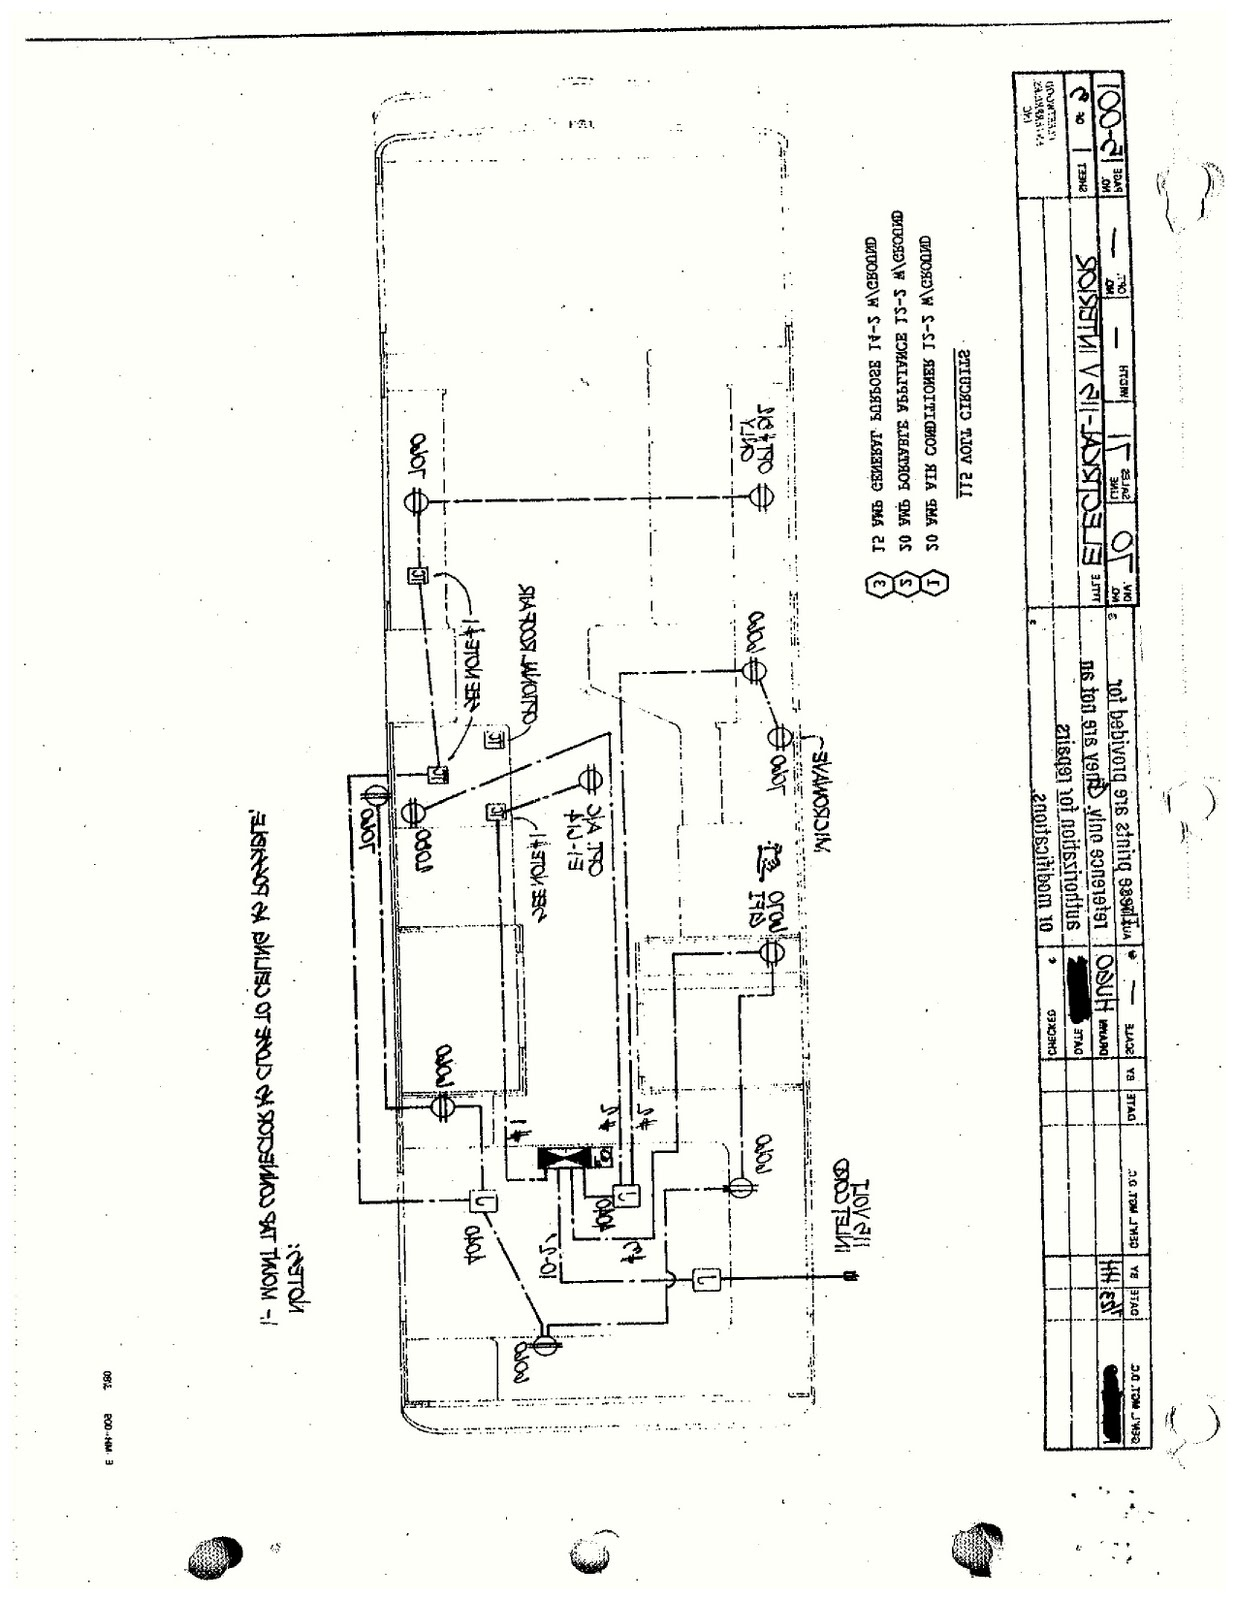 hight resolution of fleetwood mallard trailer wiring diagram simple wiring diagram 1992 fleetwood motorhome wiring diagram fleetwood mallard wiring